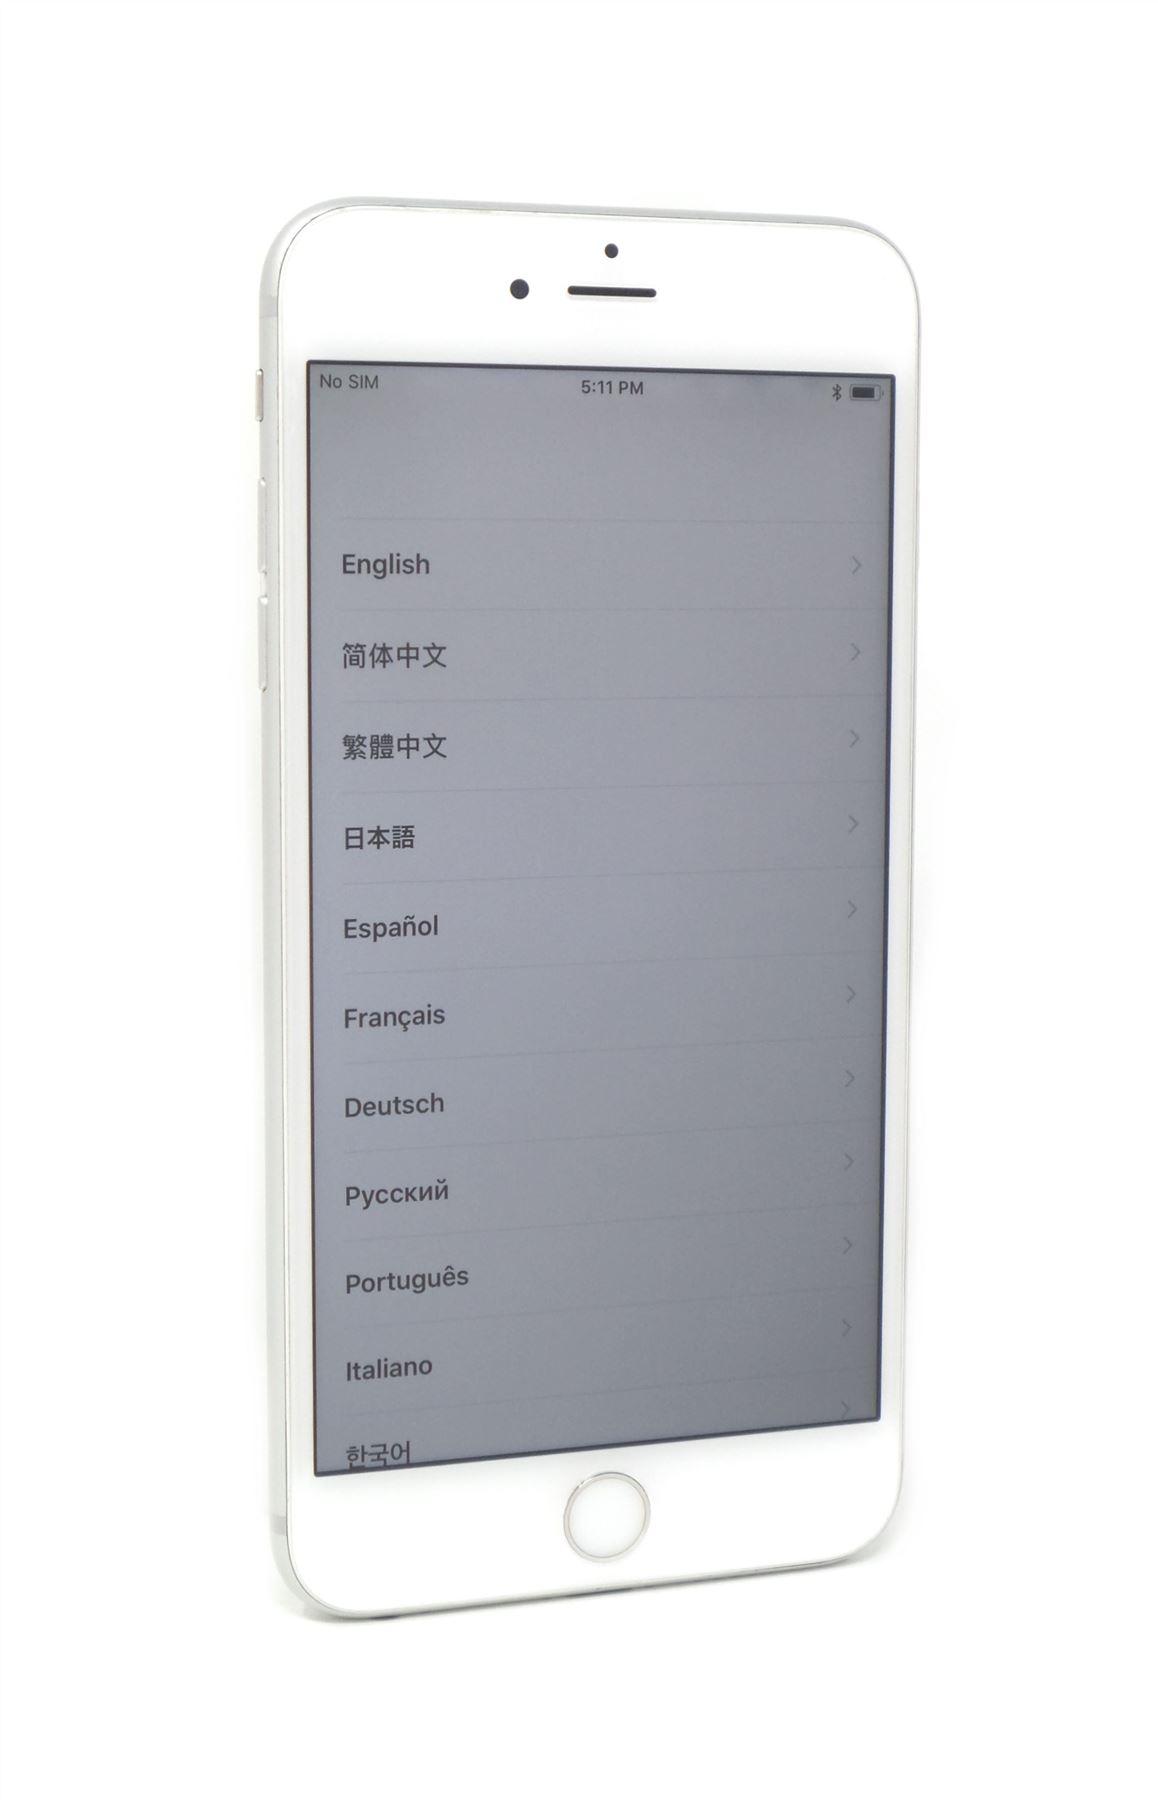 Apple-iPhone-6S-Plus-Carrier-Options-AT-amp-T-T-Mobile-Verizon-Unlocked-16-64-128GB thumbnail 19